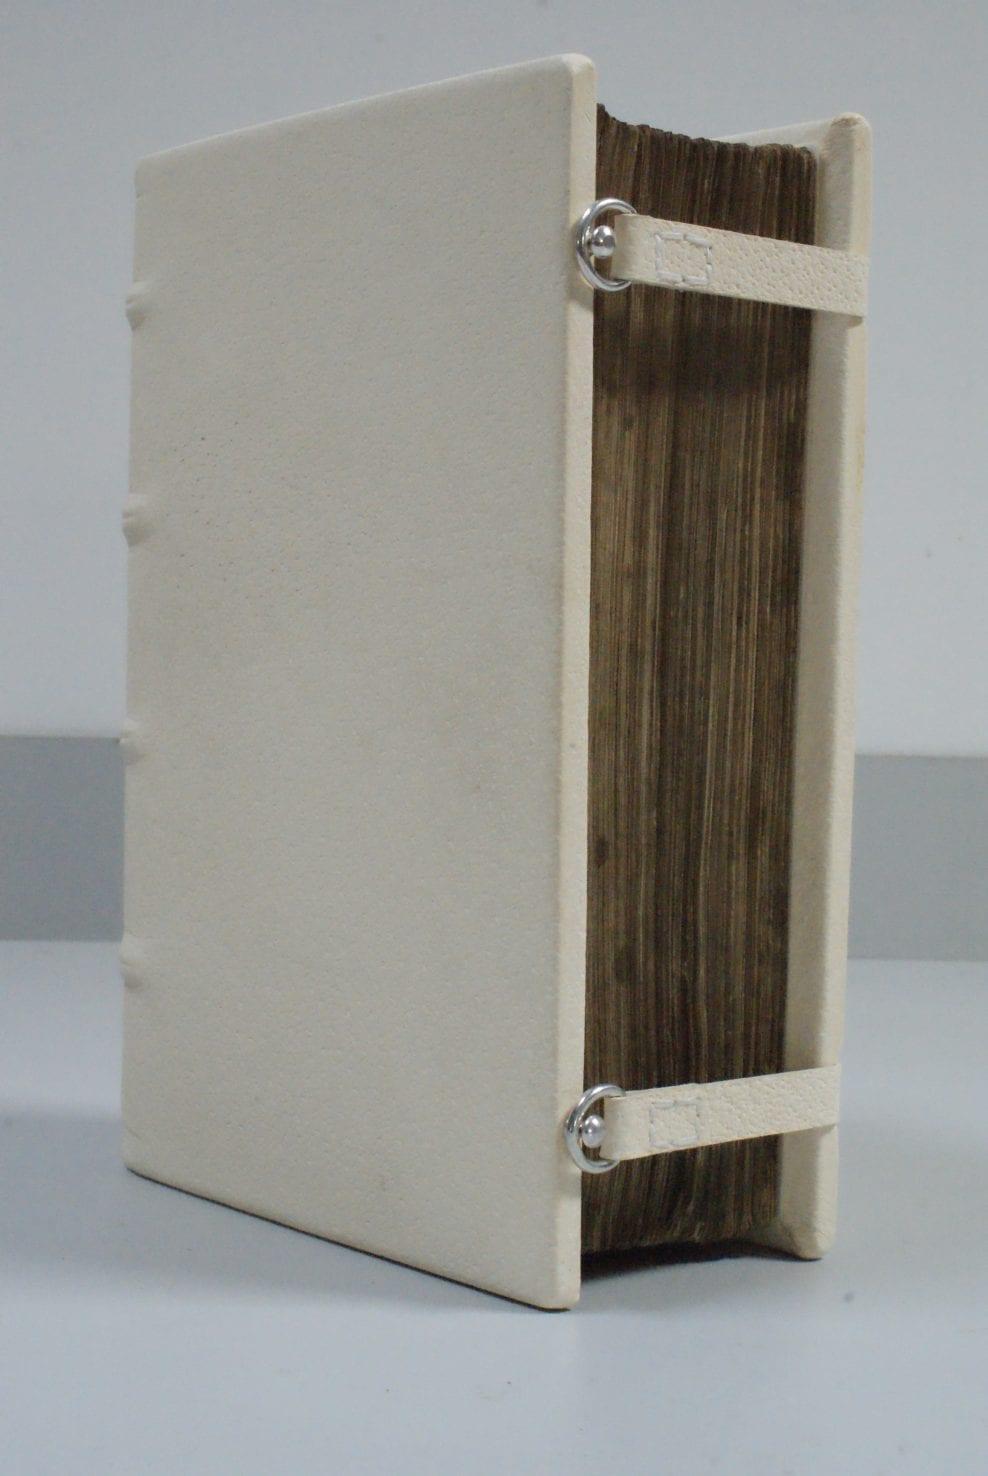 Peterhouse, Cambridge University MS. 270 14th cent. Breviary